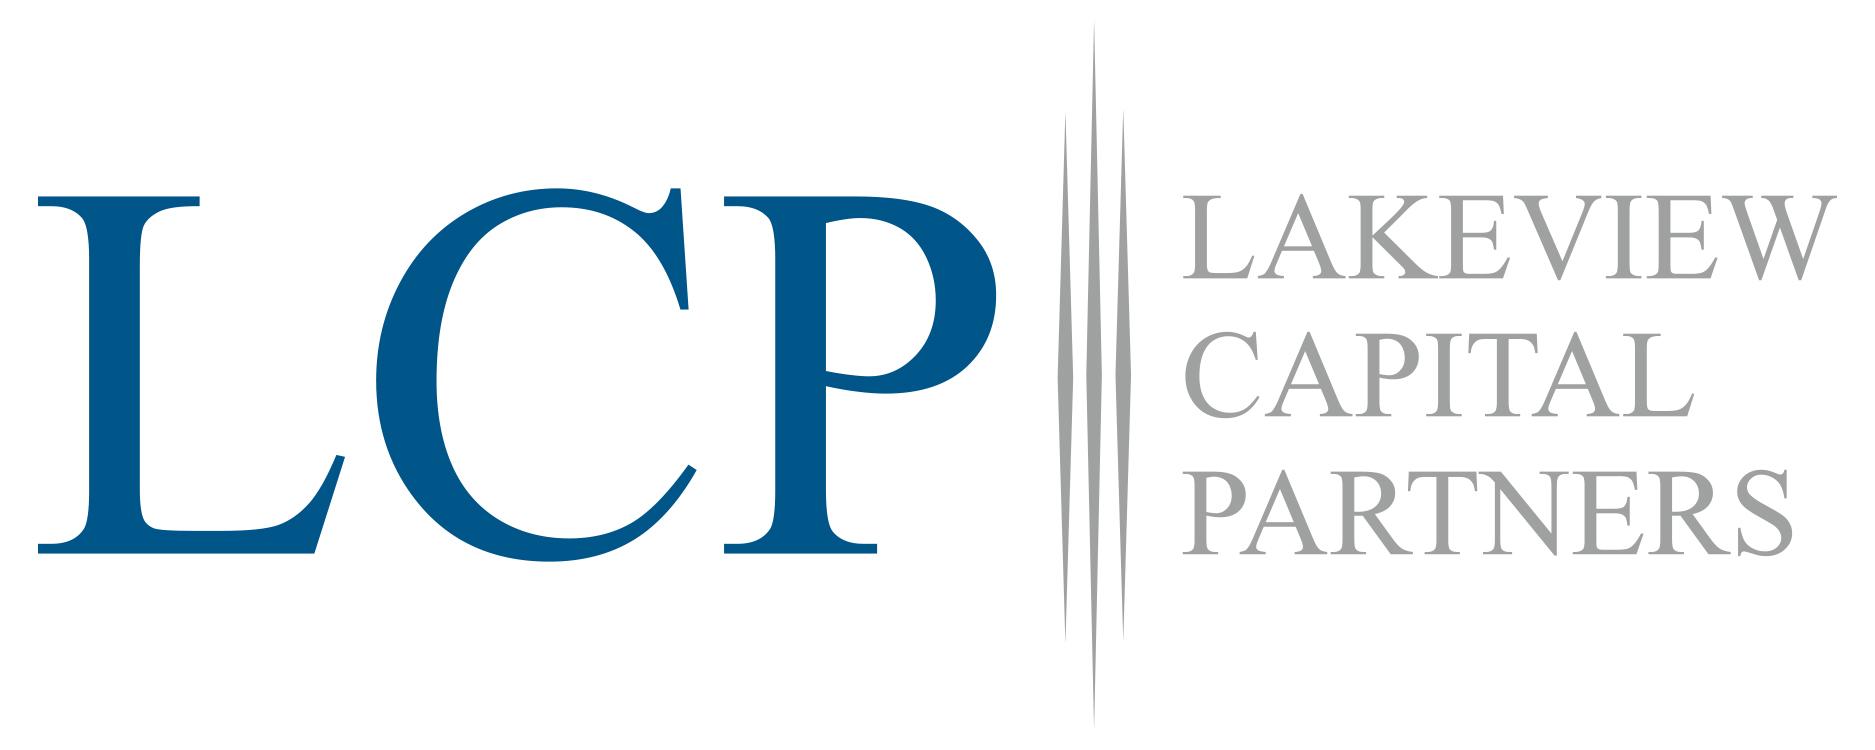 Lakeview Capital Partners - Atlanta, GA